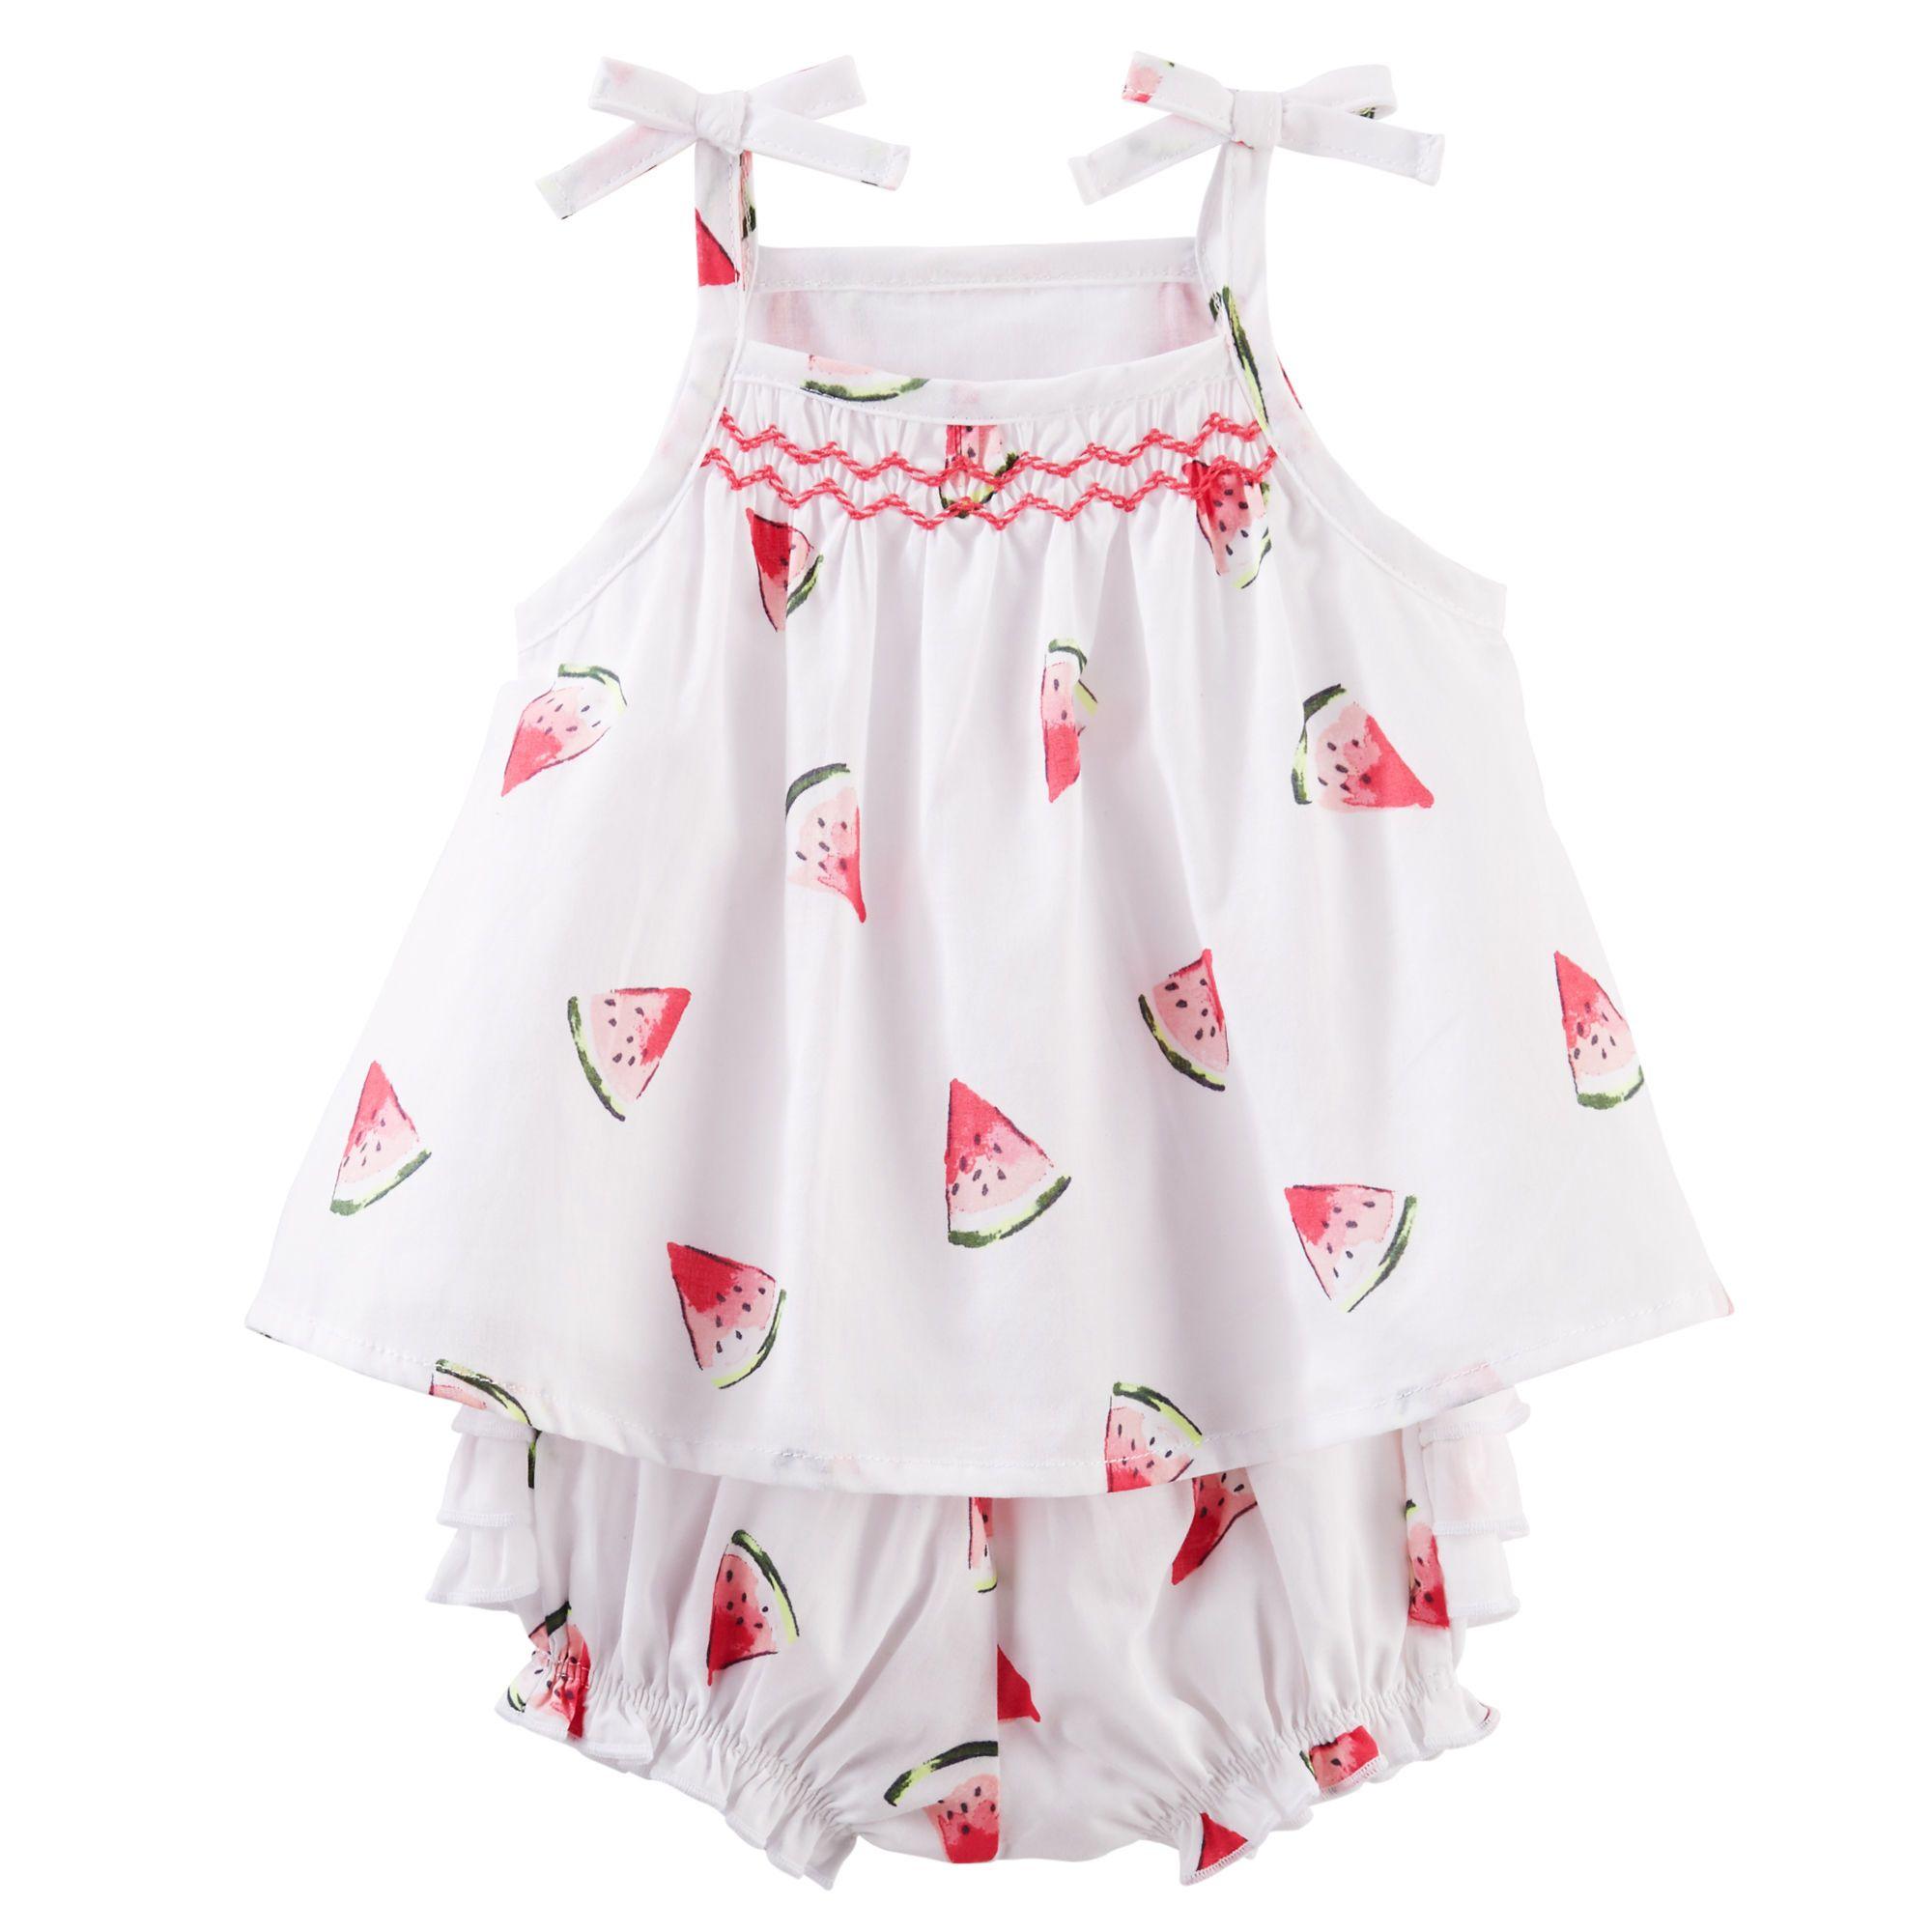 fbd8129e001a Baby Girl Watermelon Babydoll Set | OshKosh.com | Babies | Baby girl ...